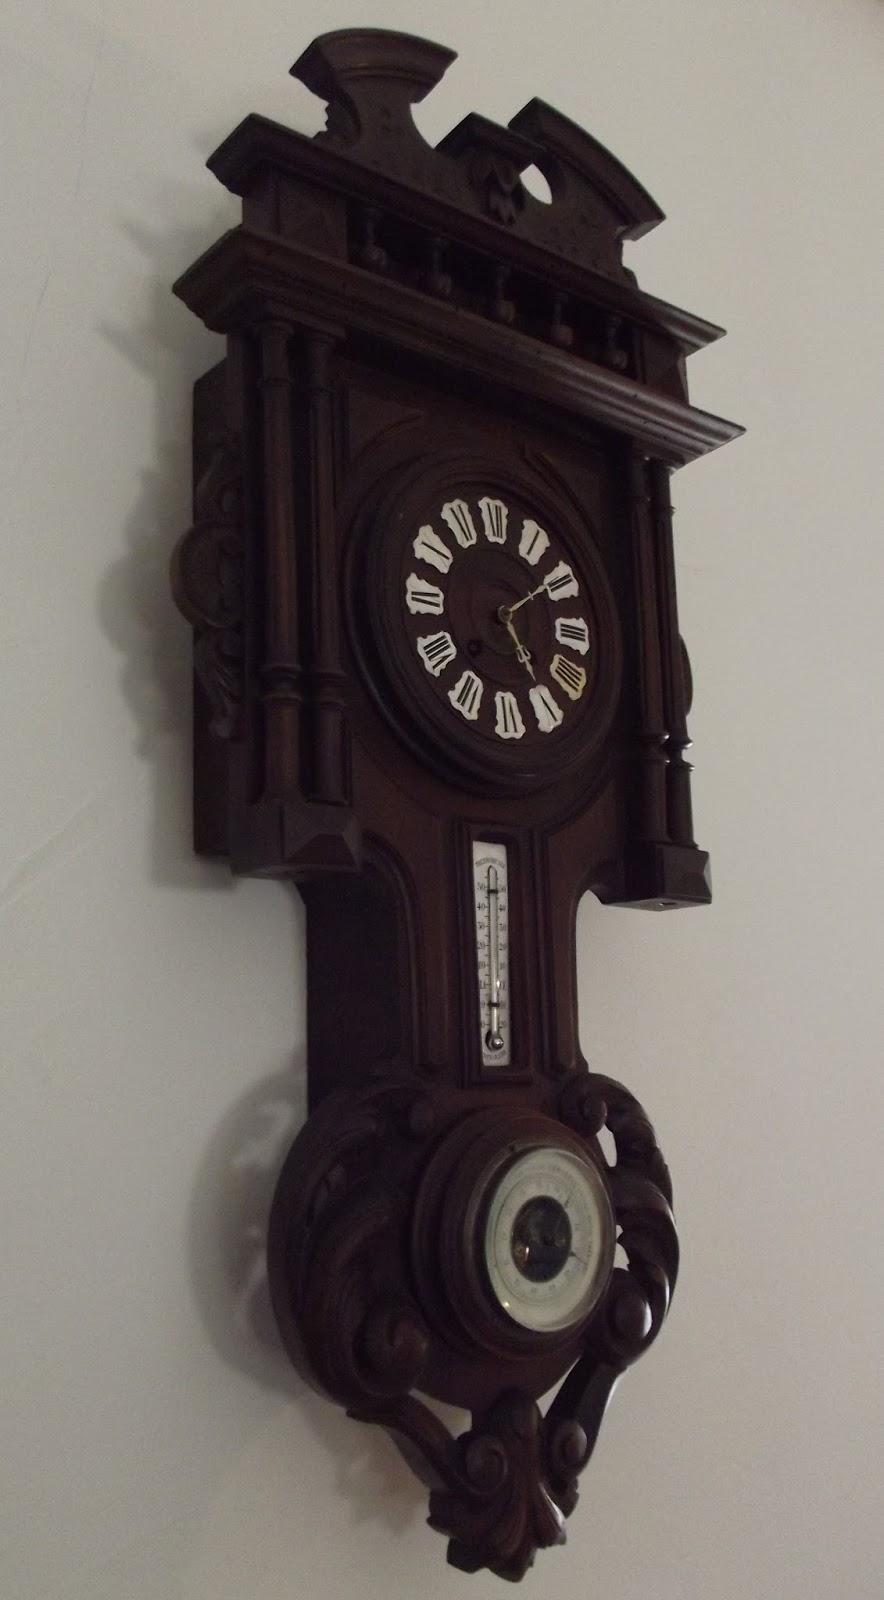 pendule murale carillon de style henry ii m canisme d 39 horlogerie xixeme. Black Bedroom Furniture Sets. Home Design Ideas